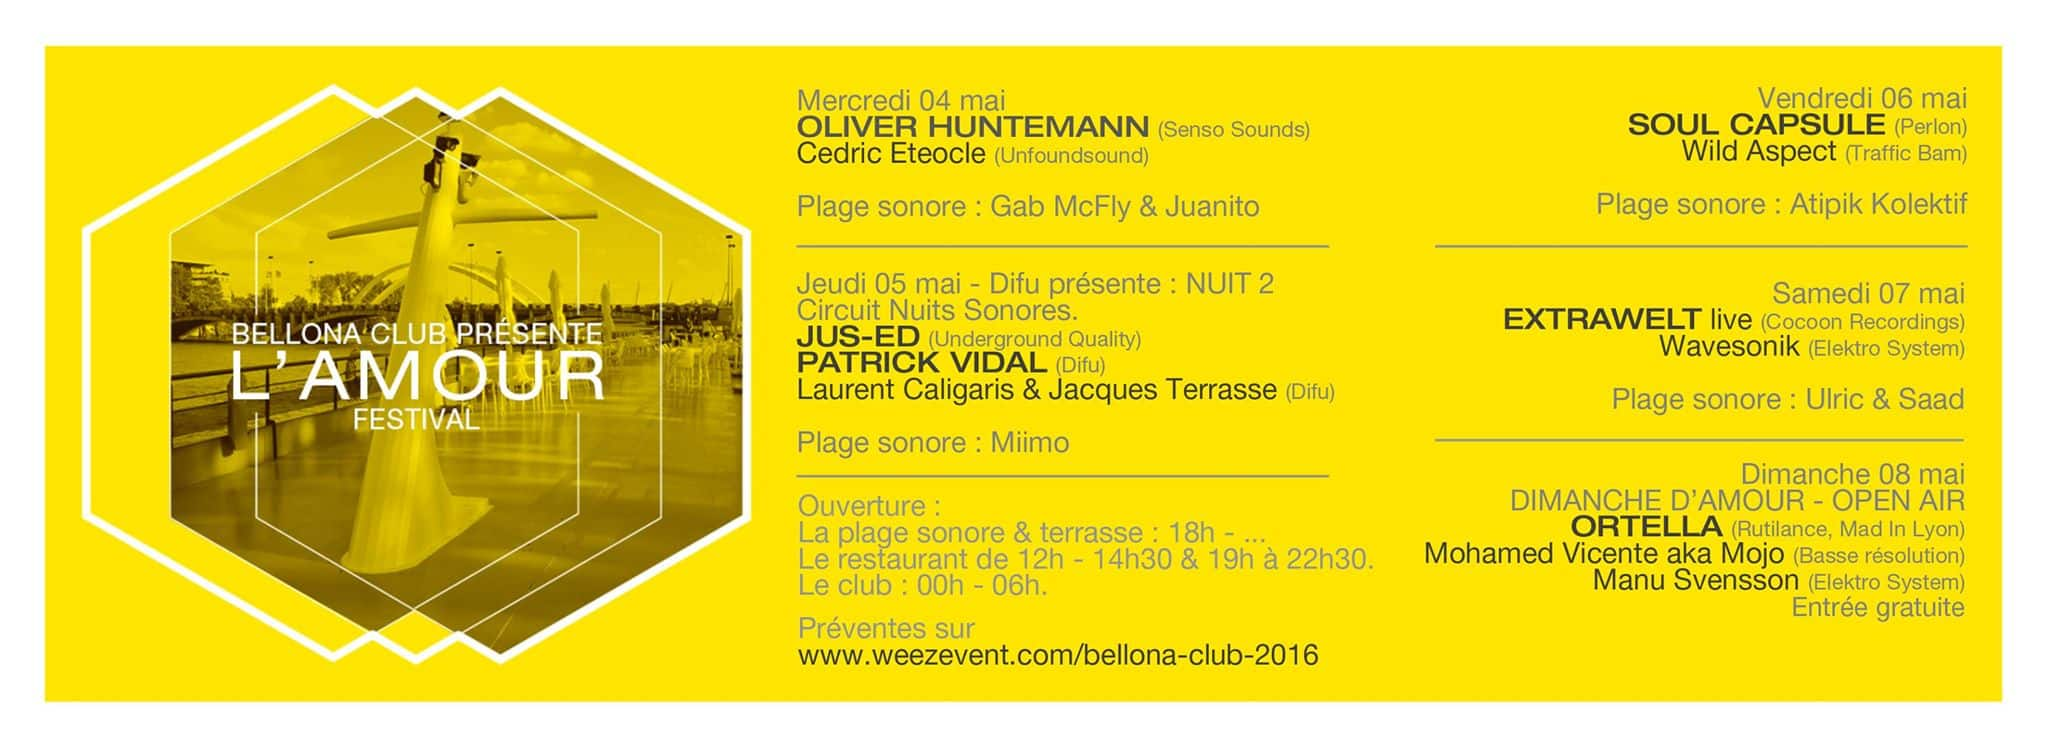 Bellona Club Juanito Huntemann